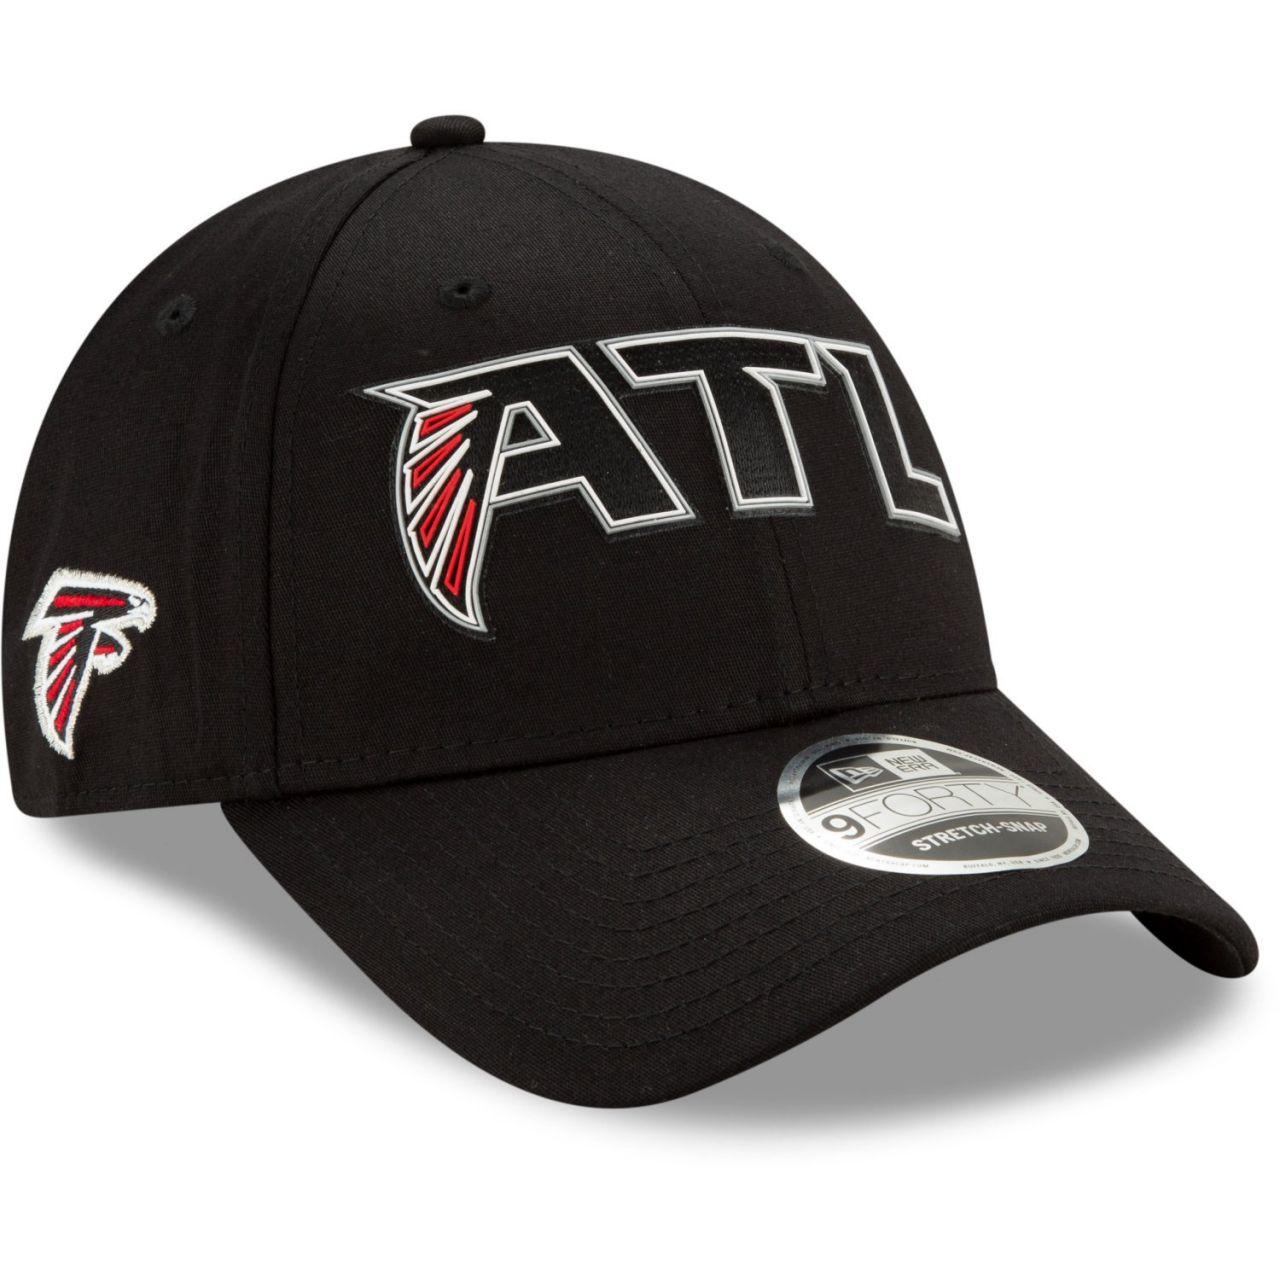 amfoo - New Era 9FORTY Stretch Snap Cap - 2020 DRAFT Atlanta Falcons